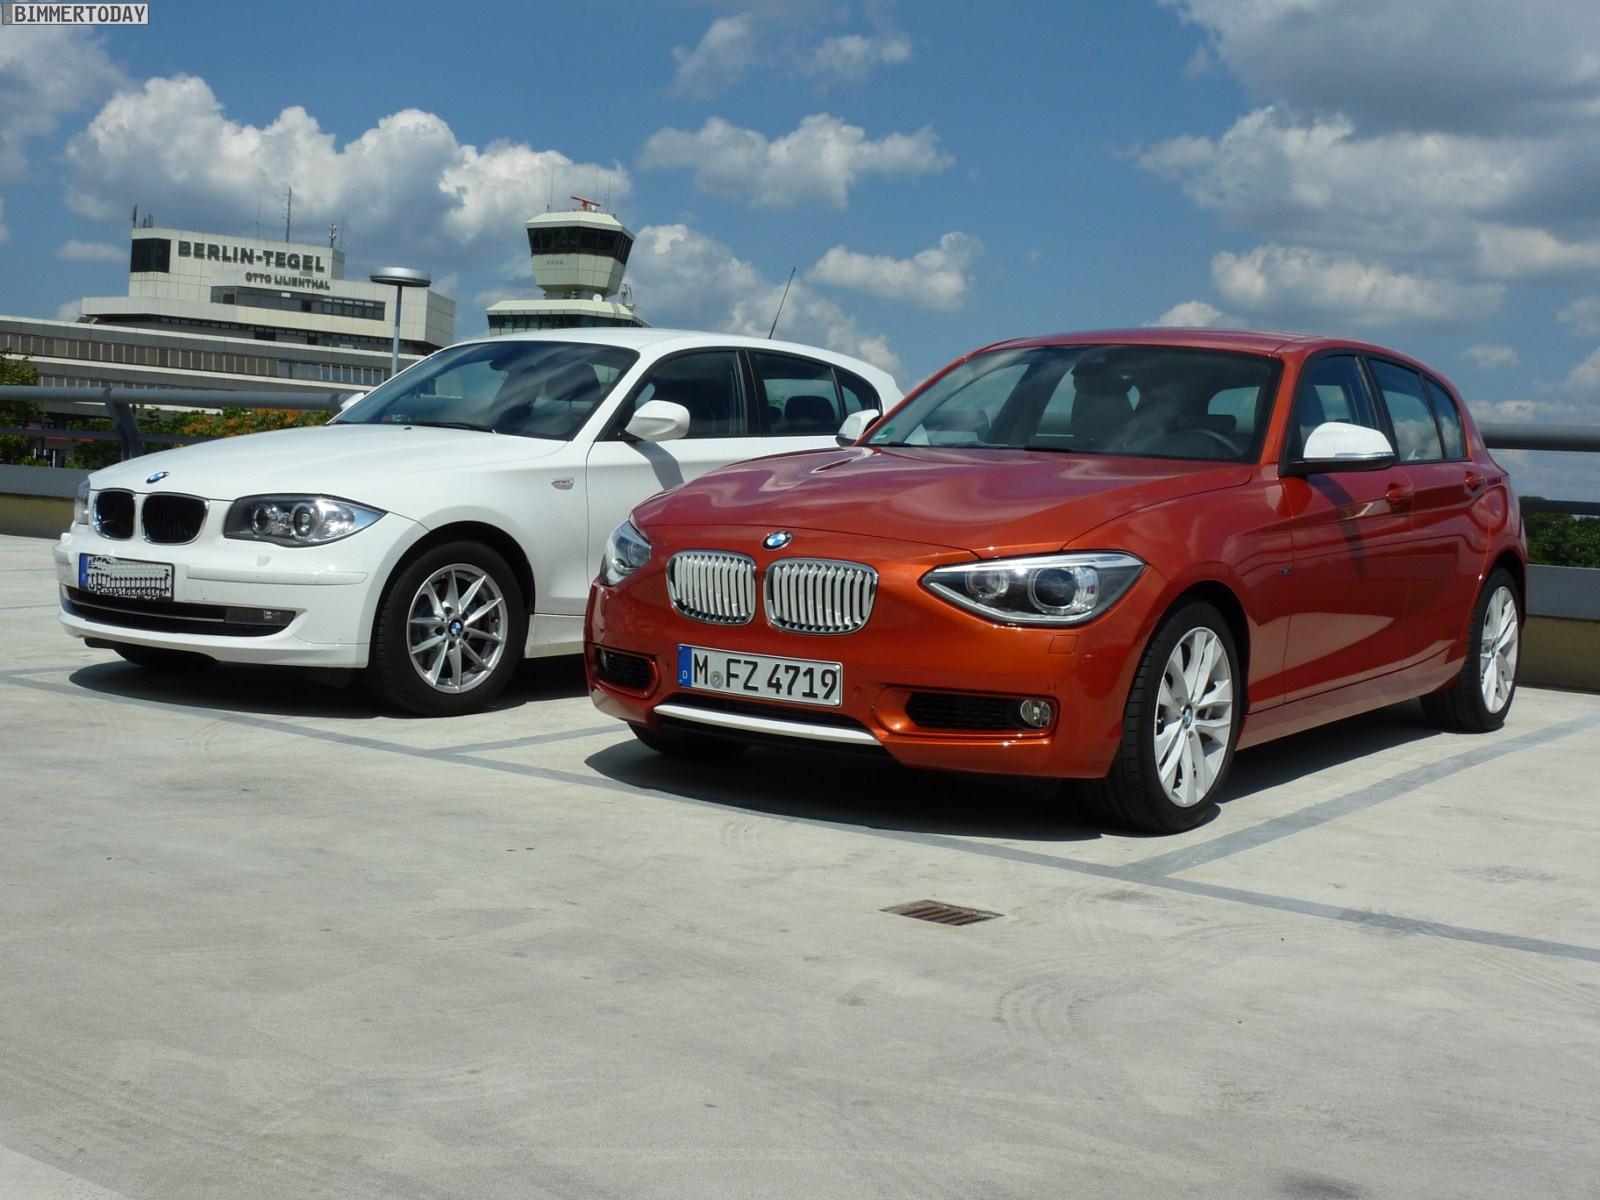 BMW 1er F20 vs E87 head to head Berlin 01